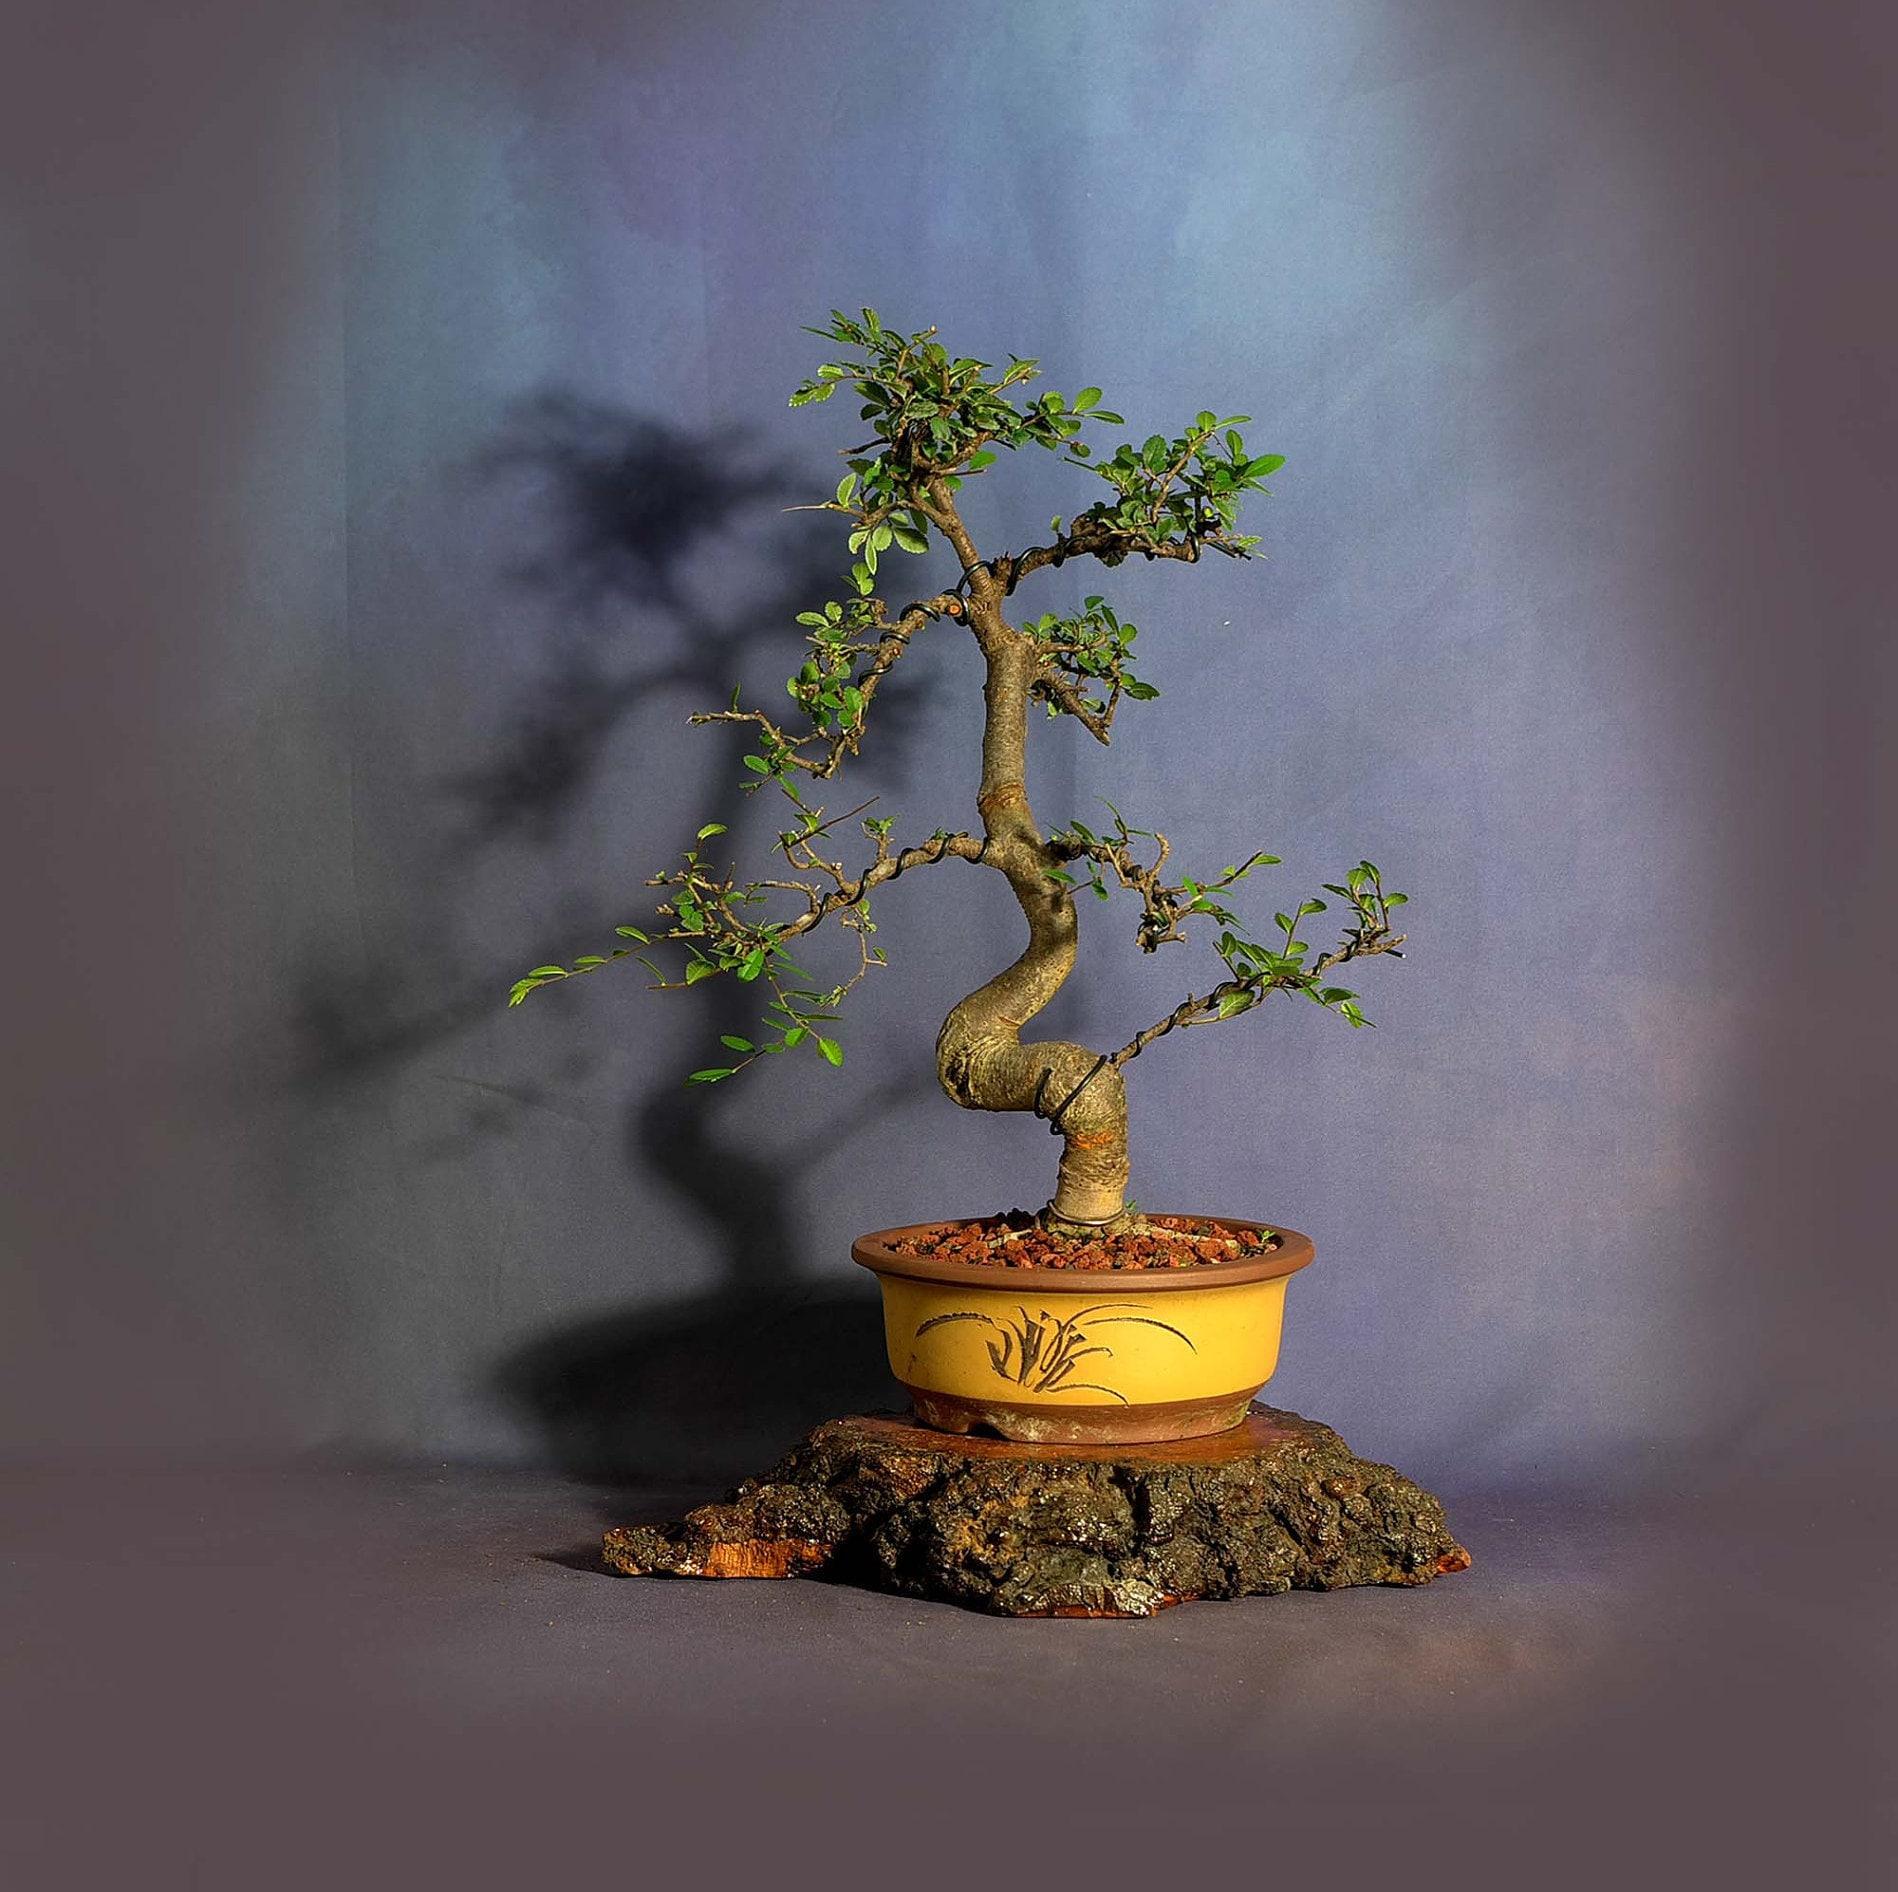 Japanese Zelkova Elm Bonsai Tree Coping Strategies Collection From Livebonsaitree